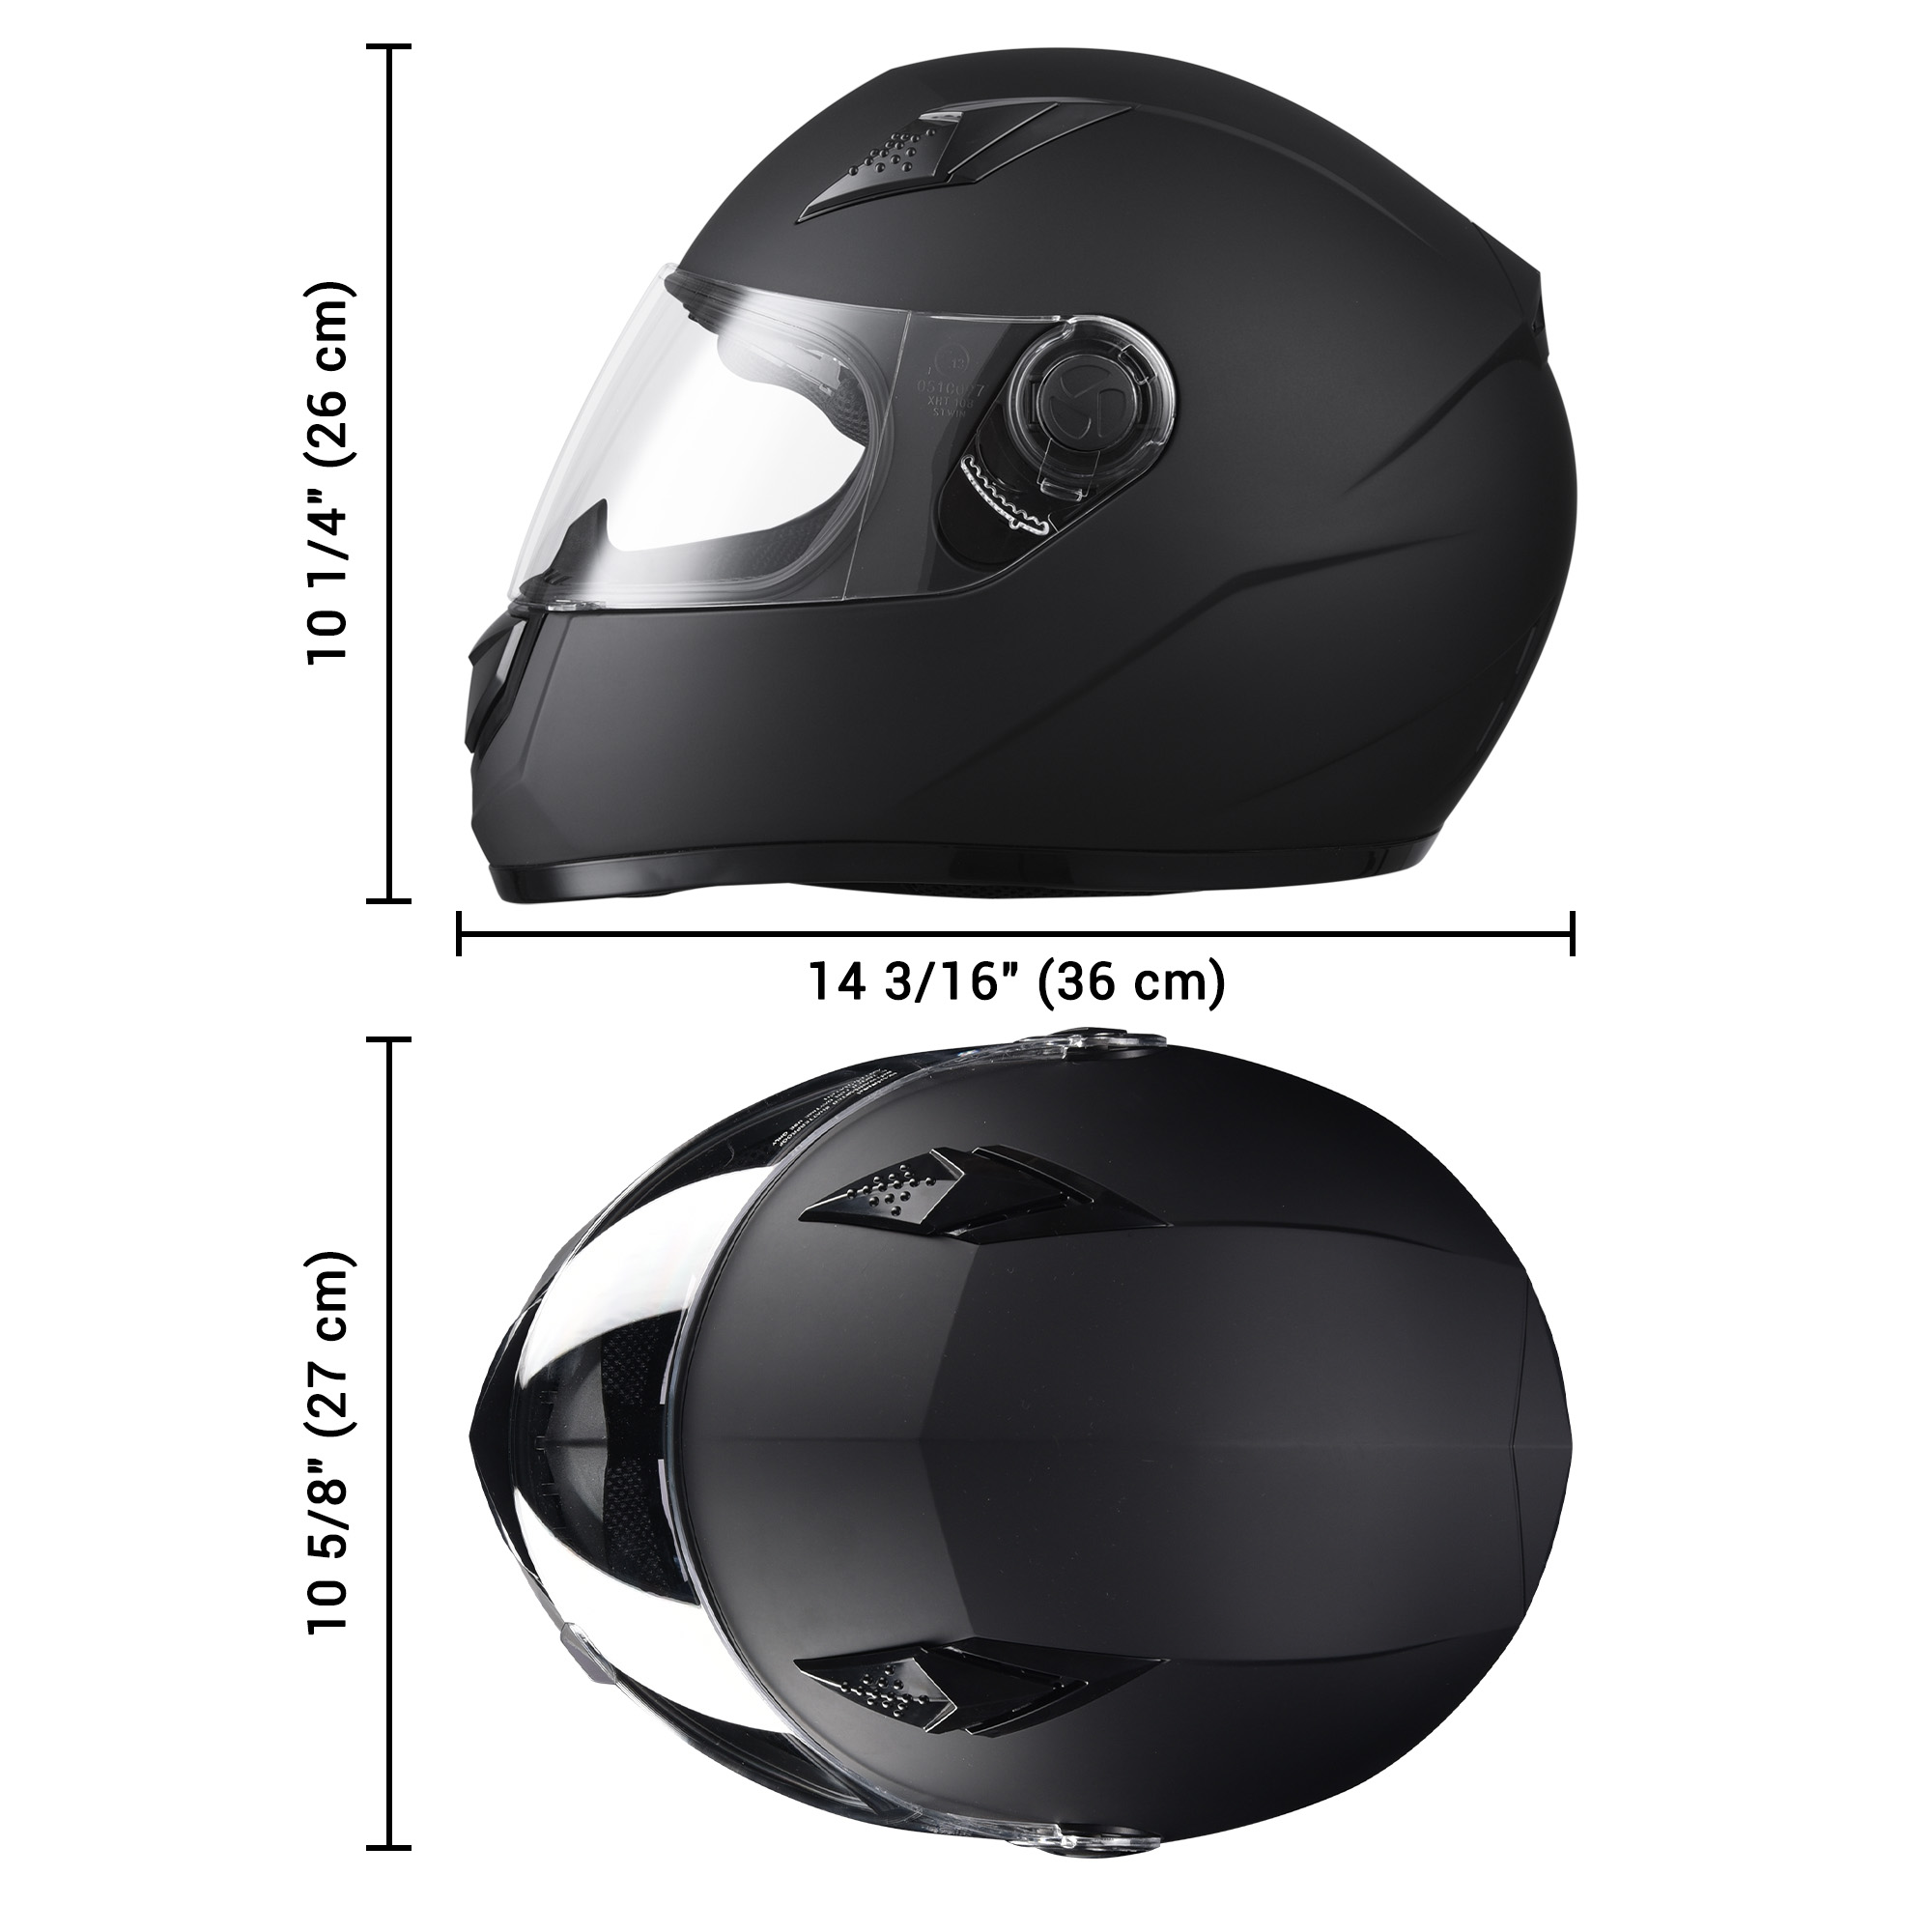 miniature 141 - AHR K12 Full Face Motorcycle Helmet DOT Air Vents Clear Visor Racing S M L XL